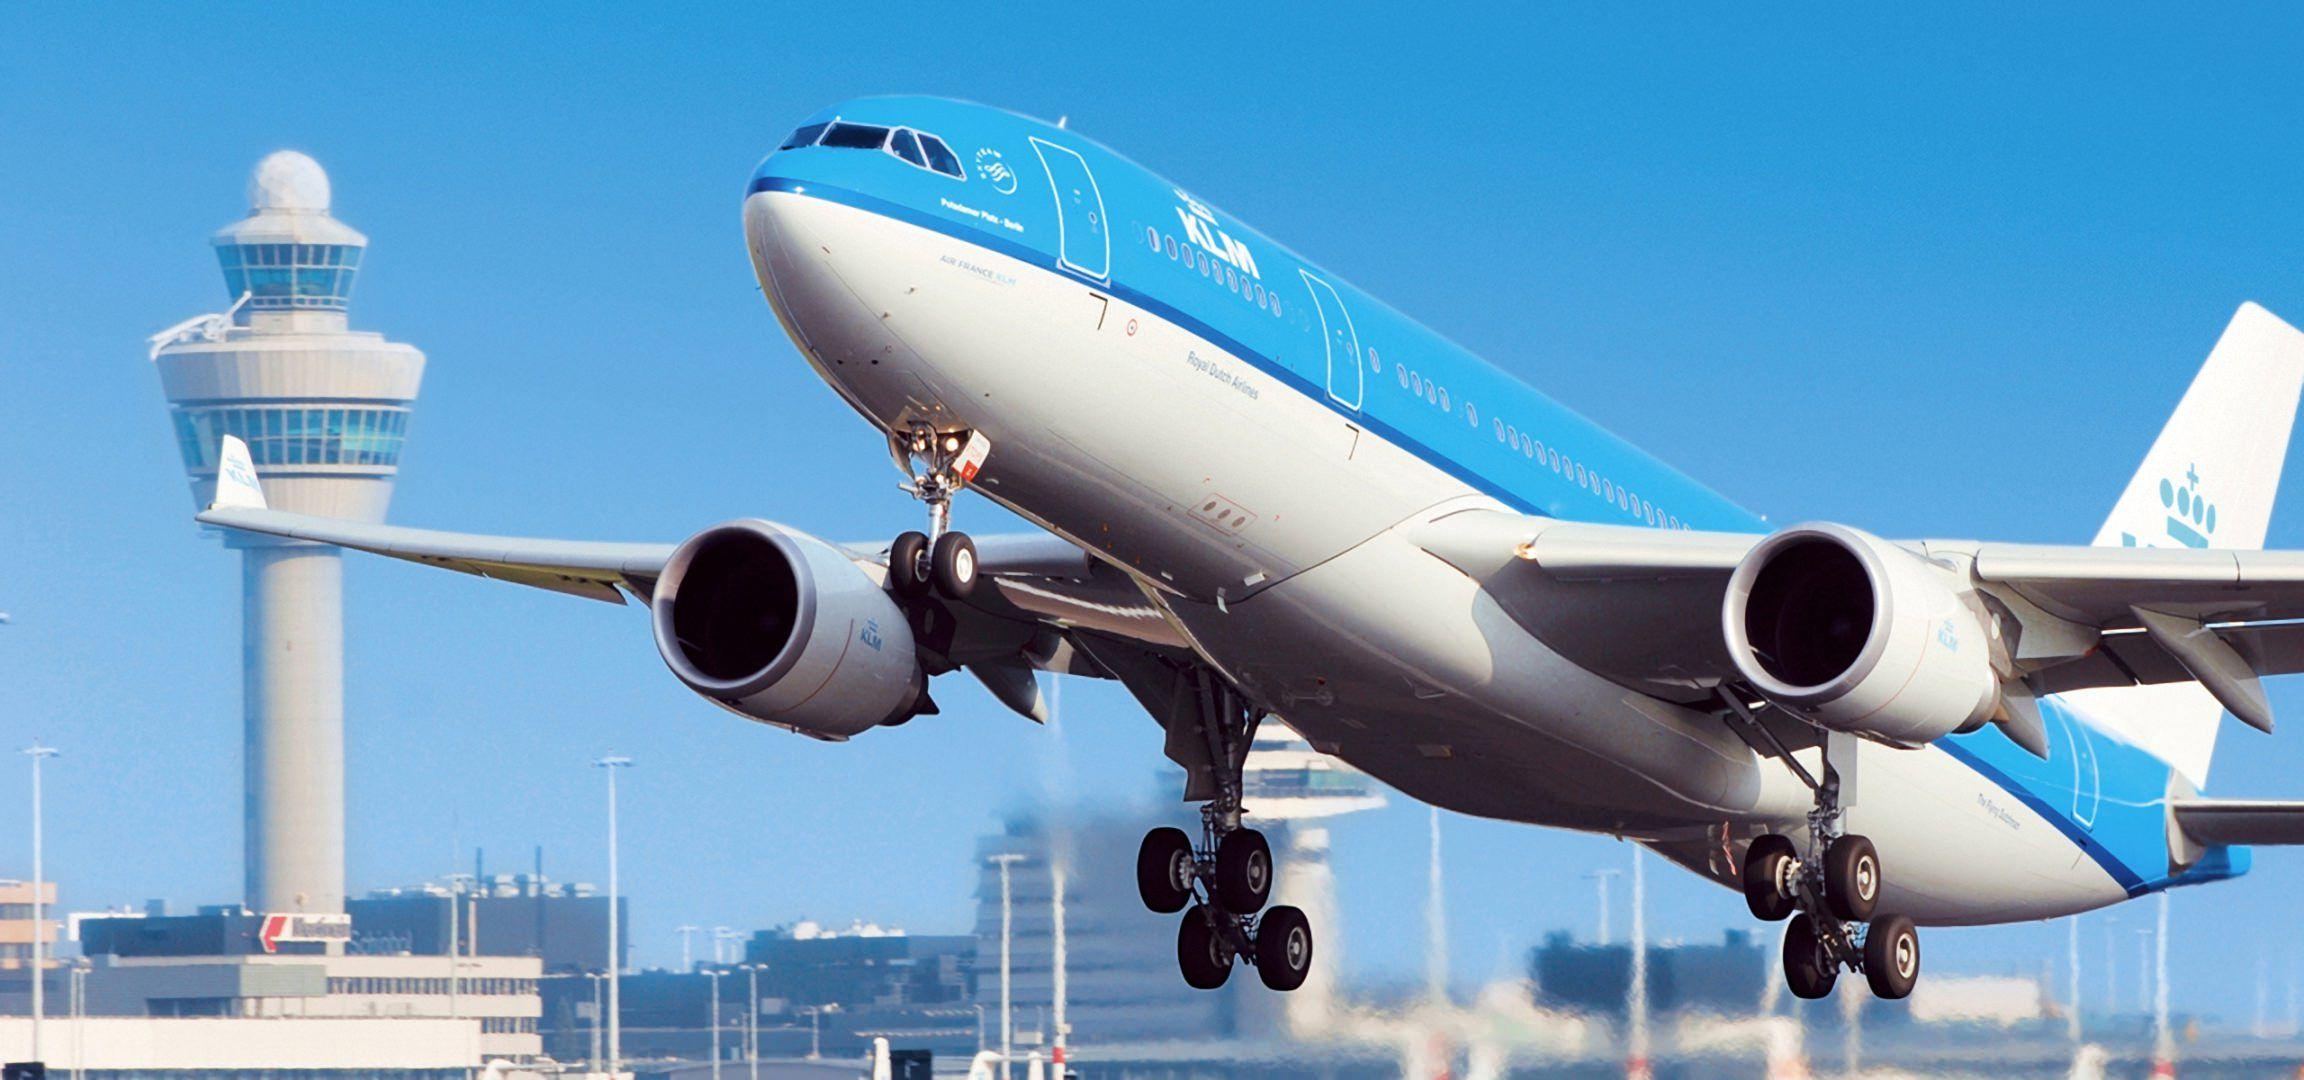 Cygnific Klm Airfrance Vliegtuig Air France Amsterdam